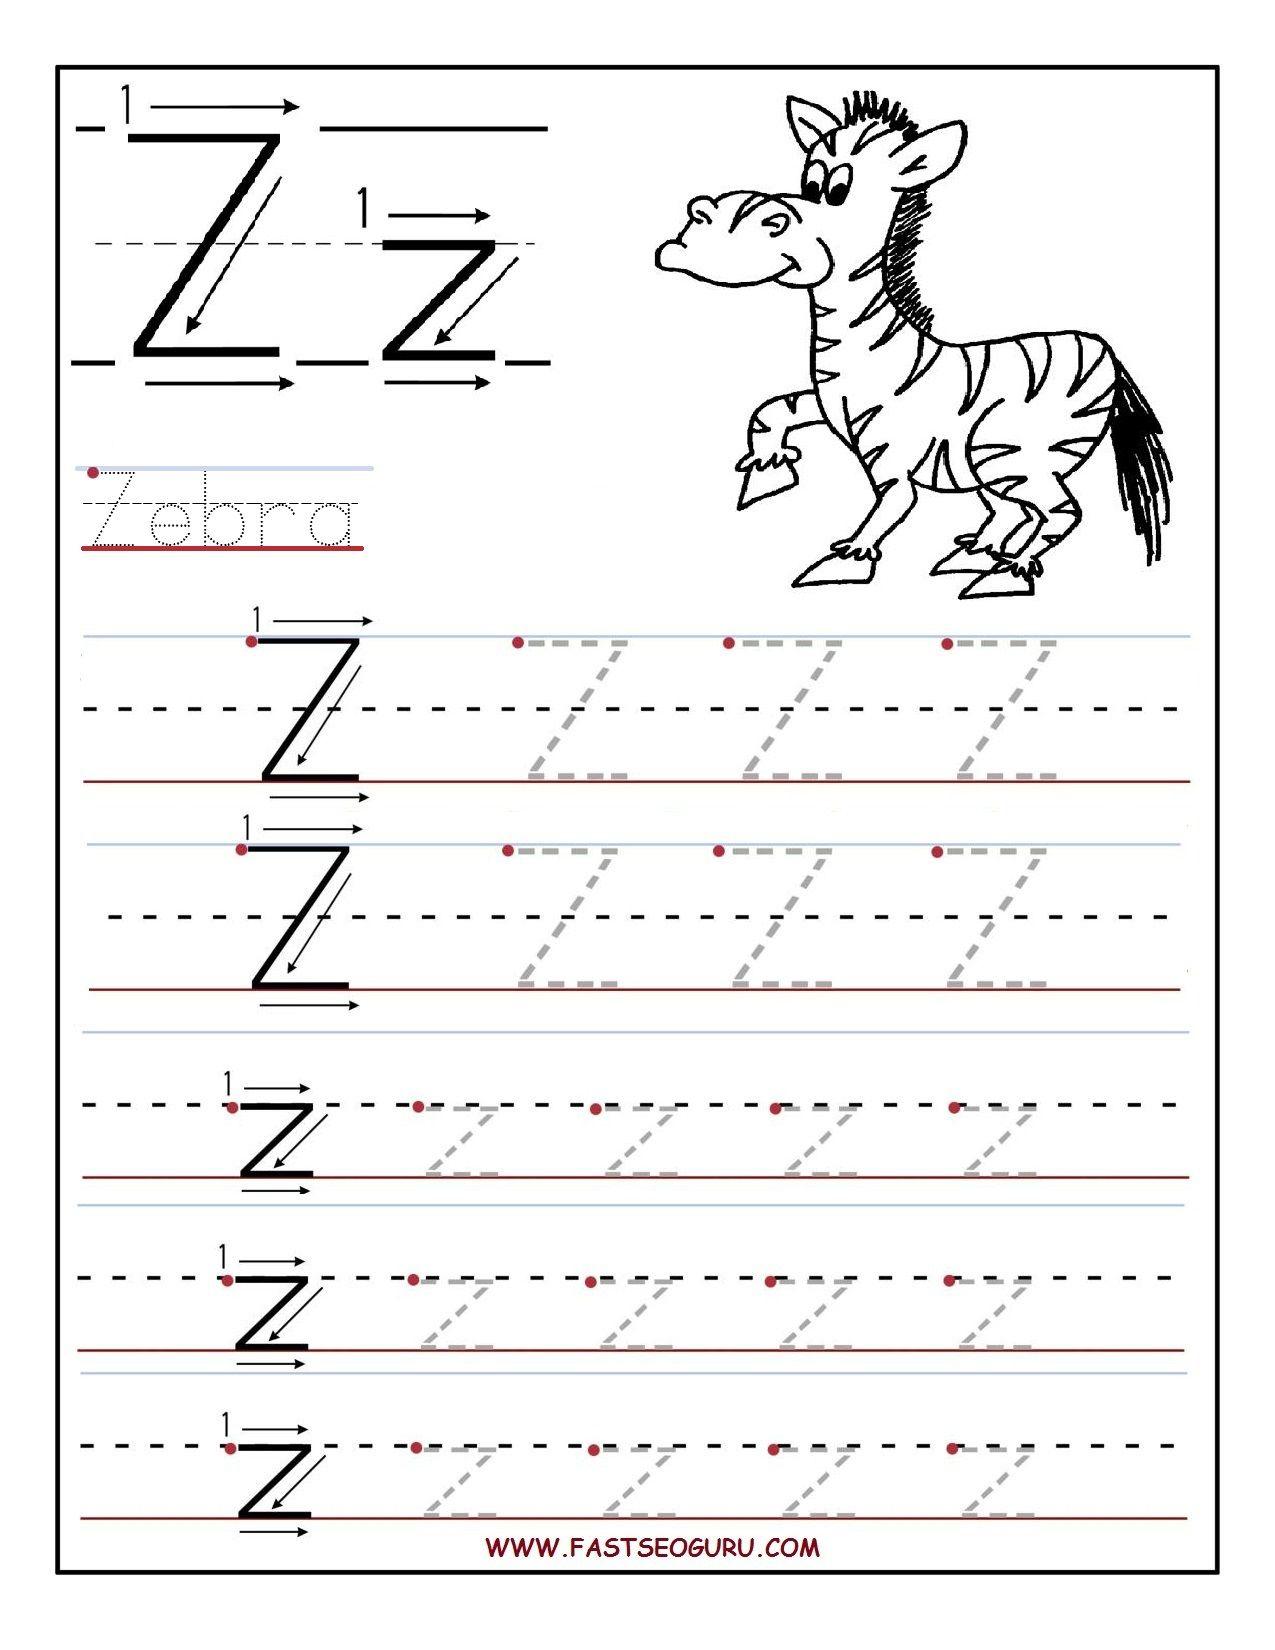 Printable Letter Z Tracing Worksheets For Preschool (With throughout Letter Z Tracing Worksheets